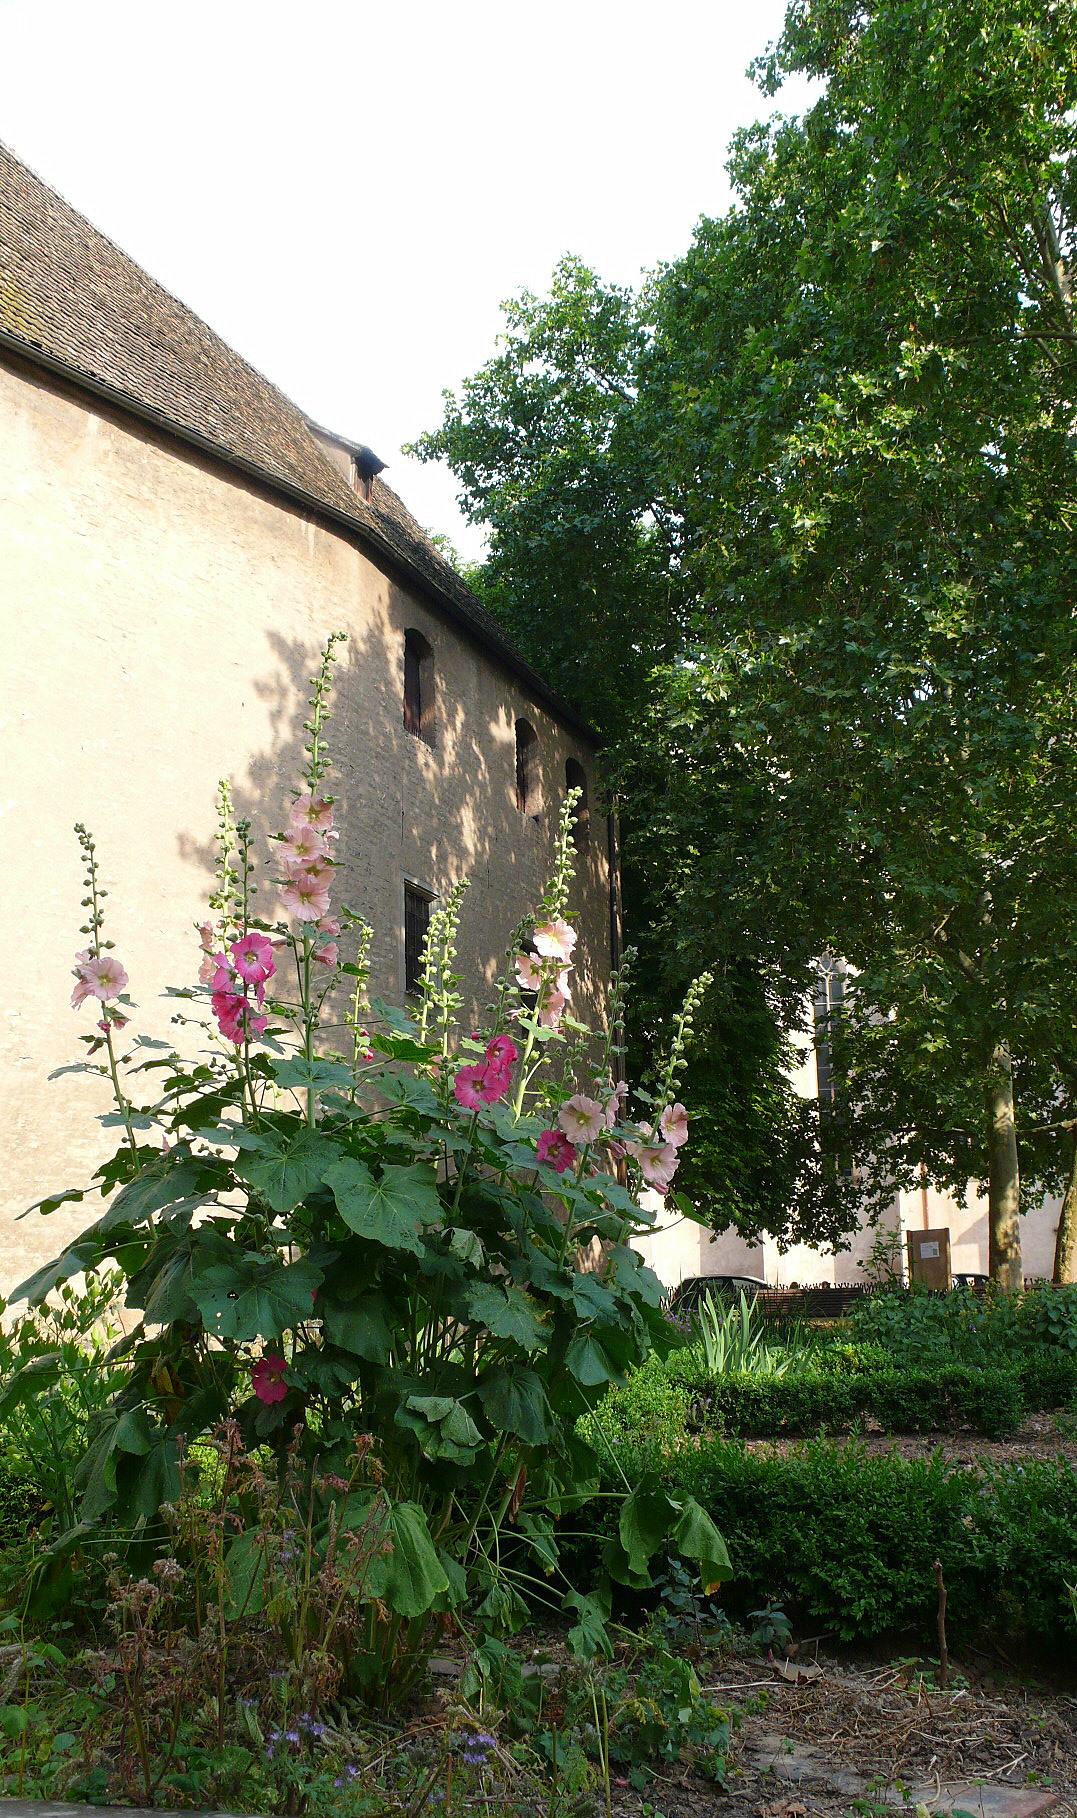 Le jardin secret catherine burg artwork celeste prize for Le jardin secret livre